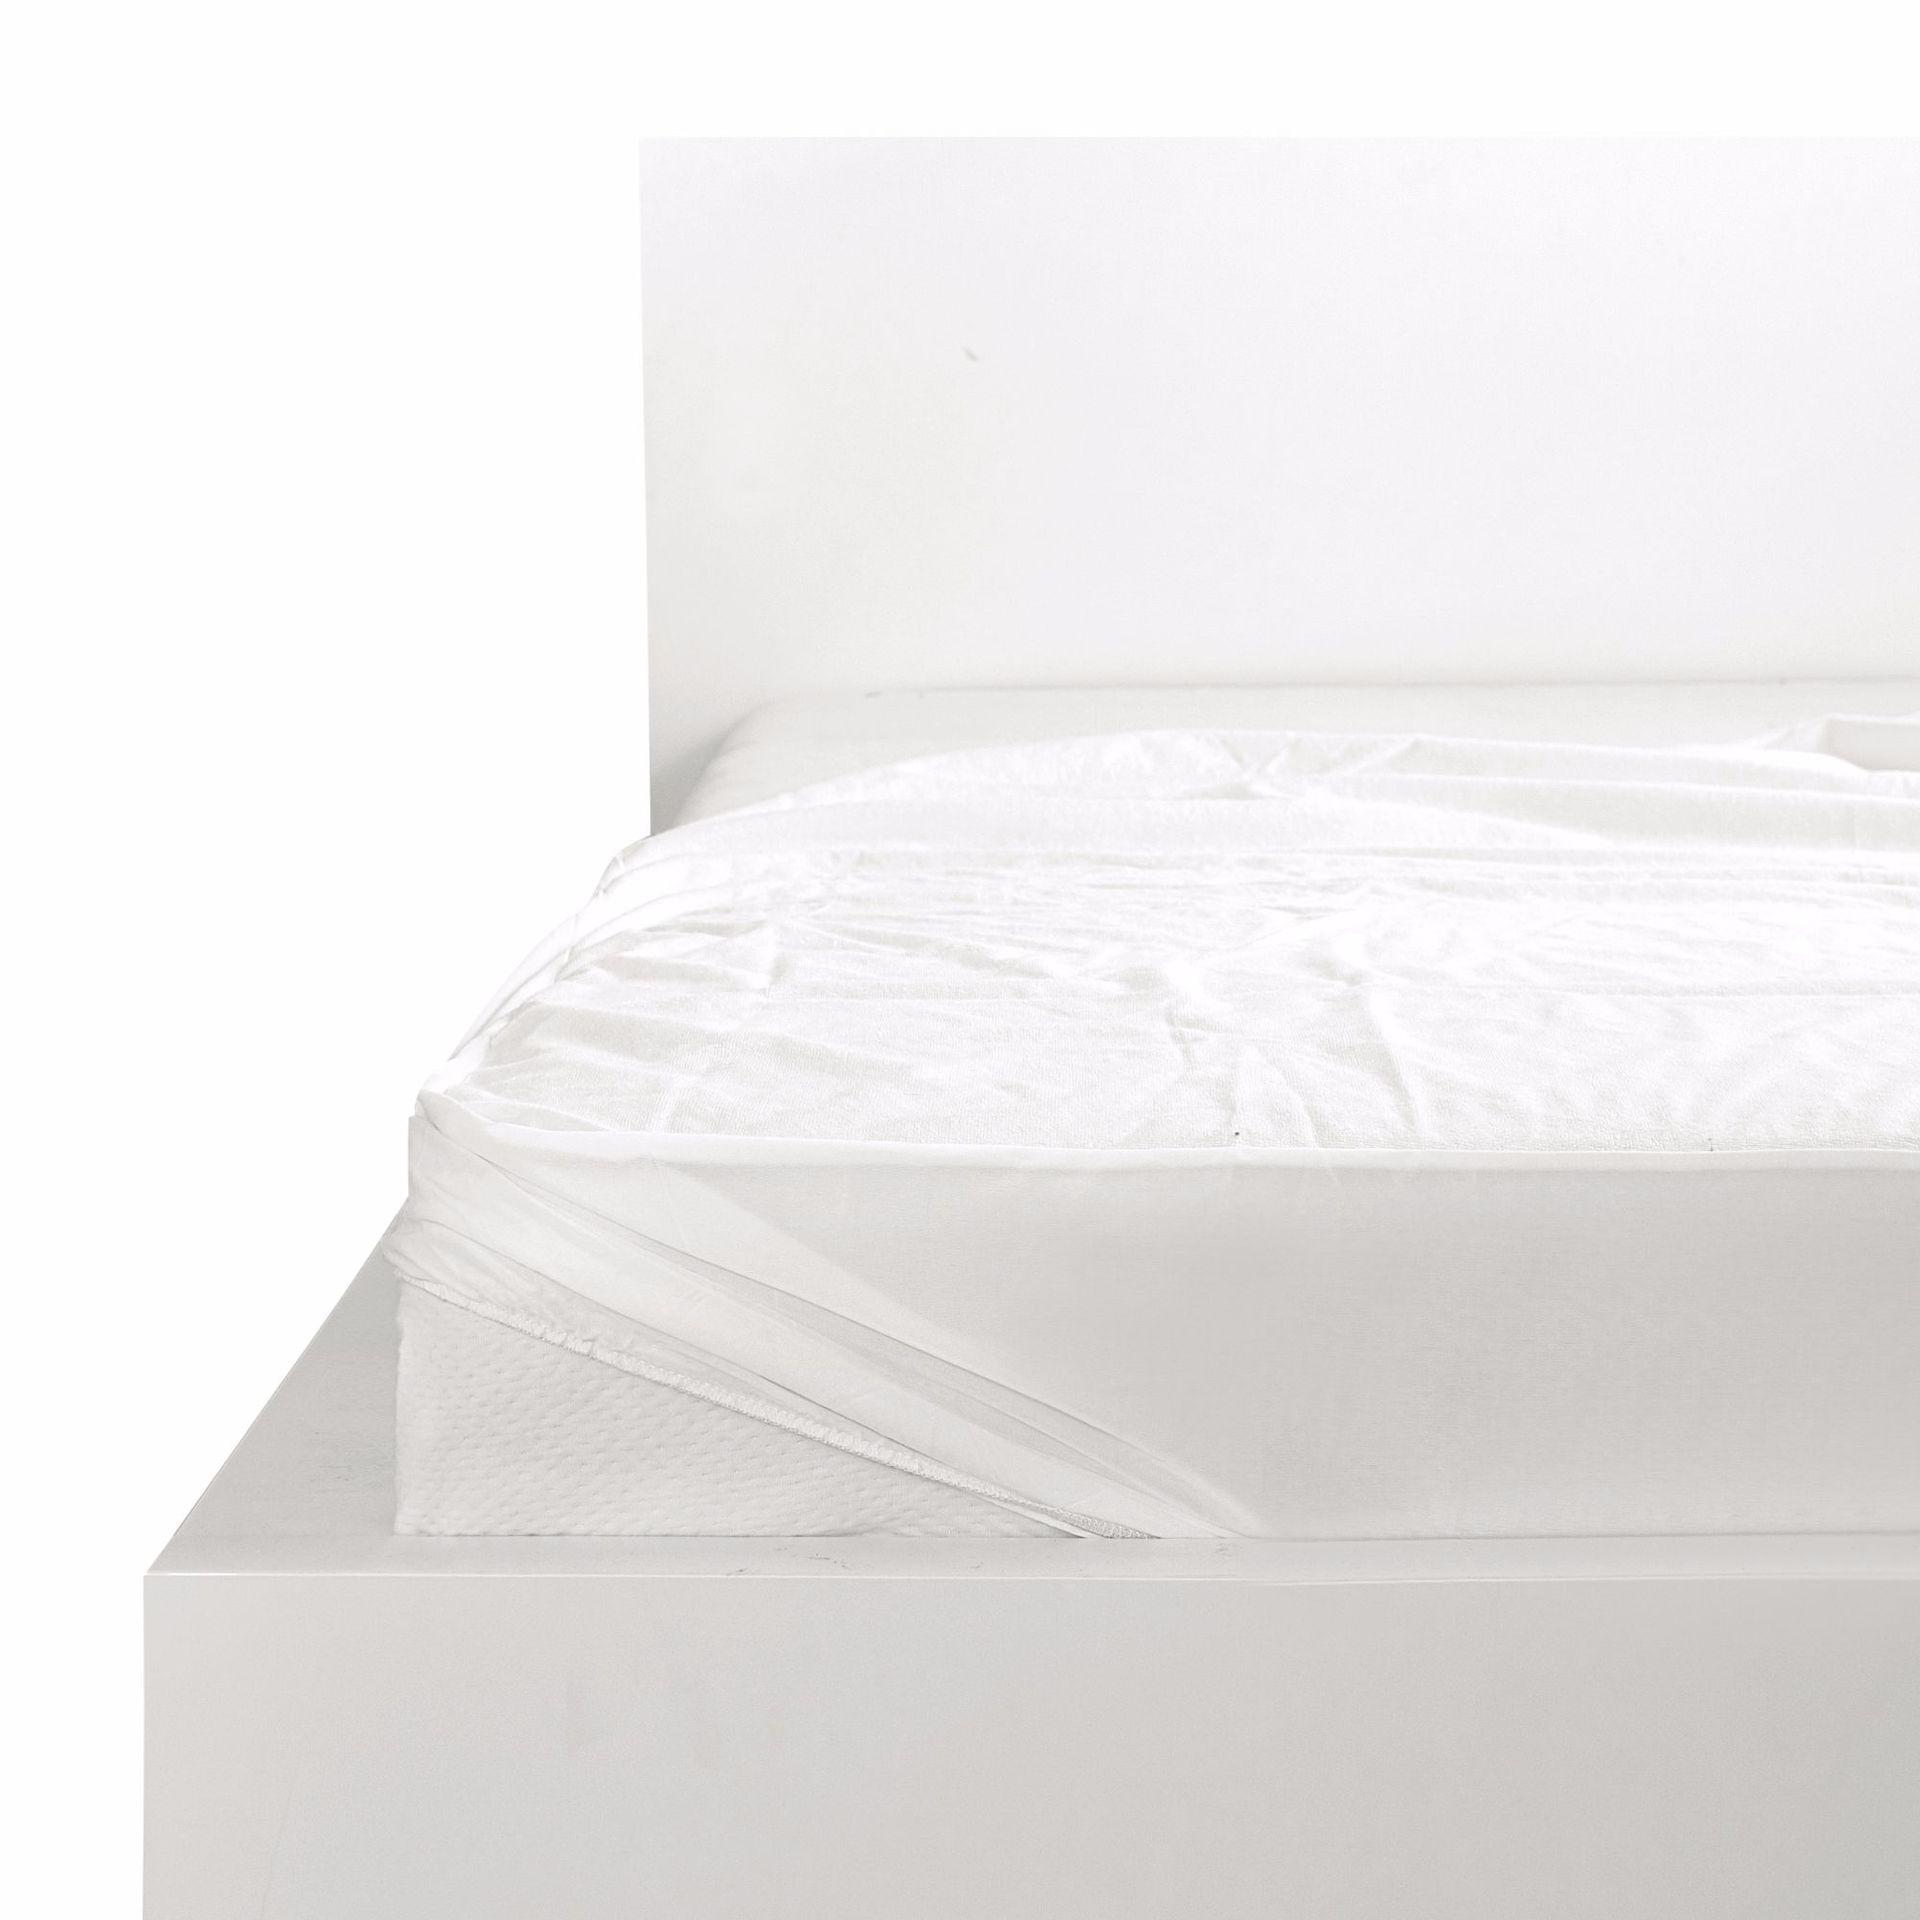 waterproof mattress protector for kids, waterproof mattress protector hypoallergenic, waterproof mattress protector heavy duty - Jozy Mattress | Jozy.net